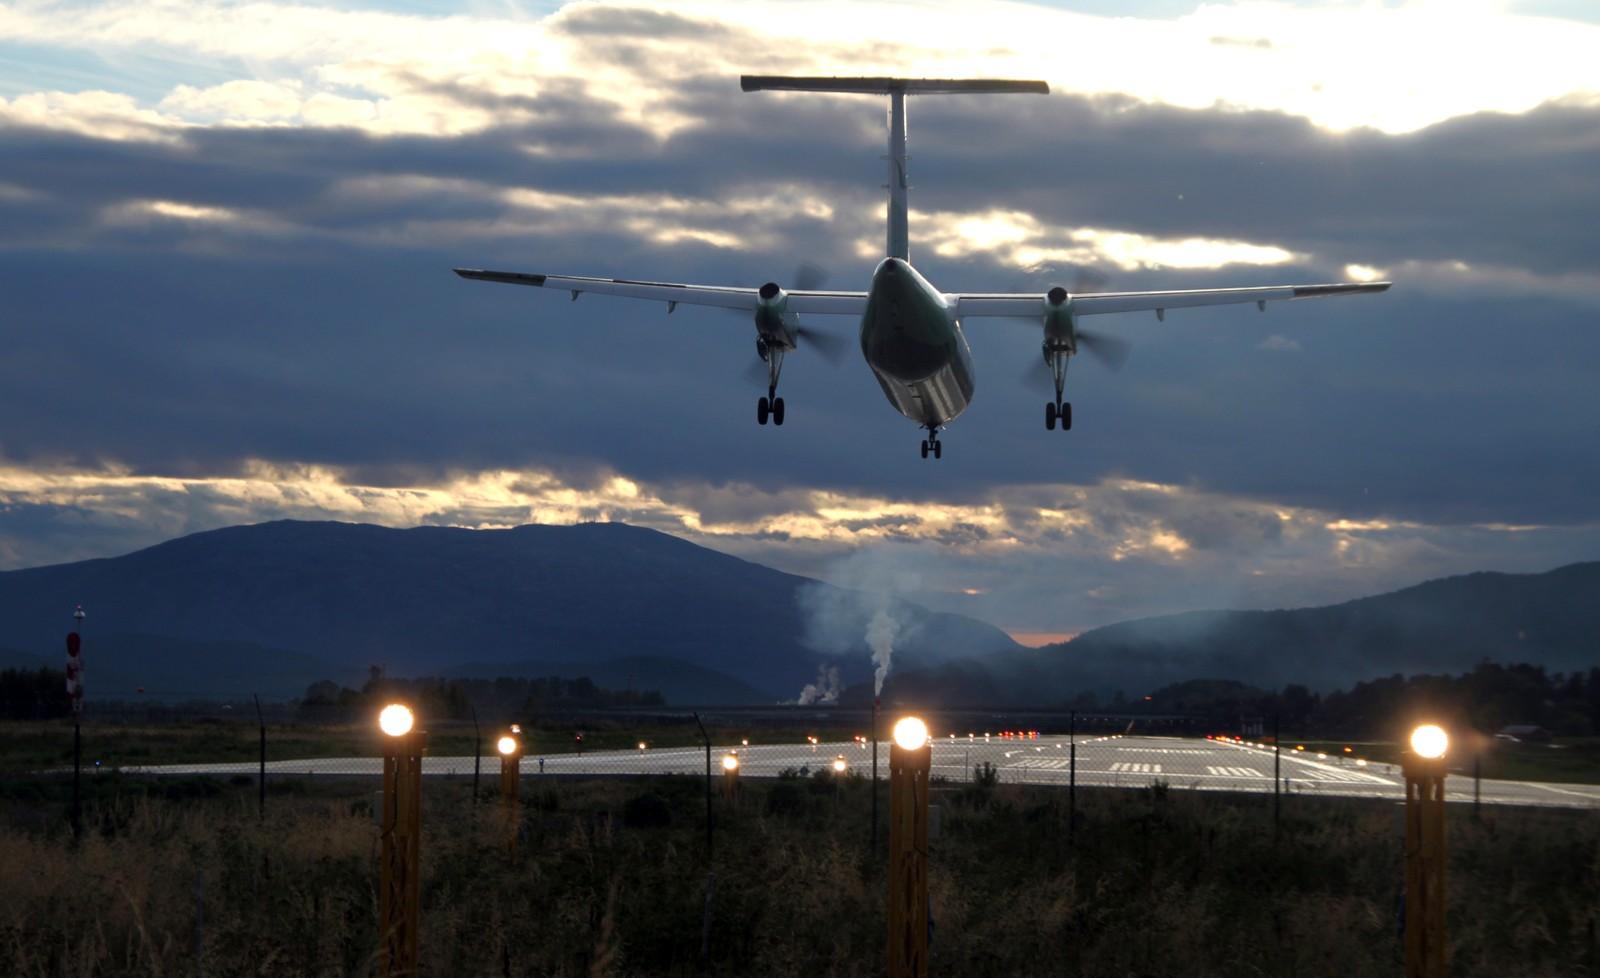 September: Innflyging til Namsos lufthavn